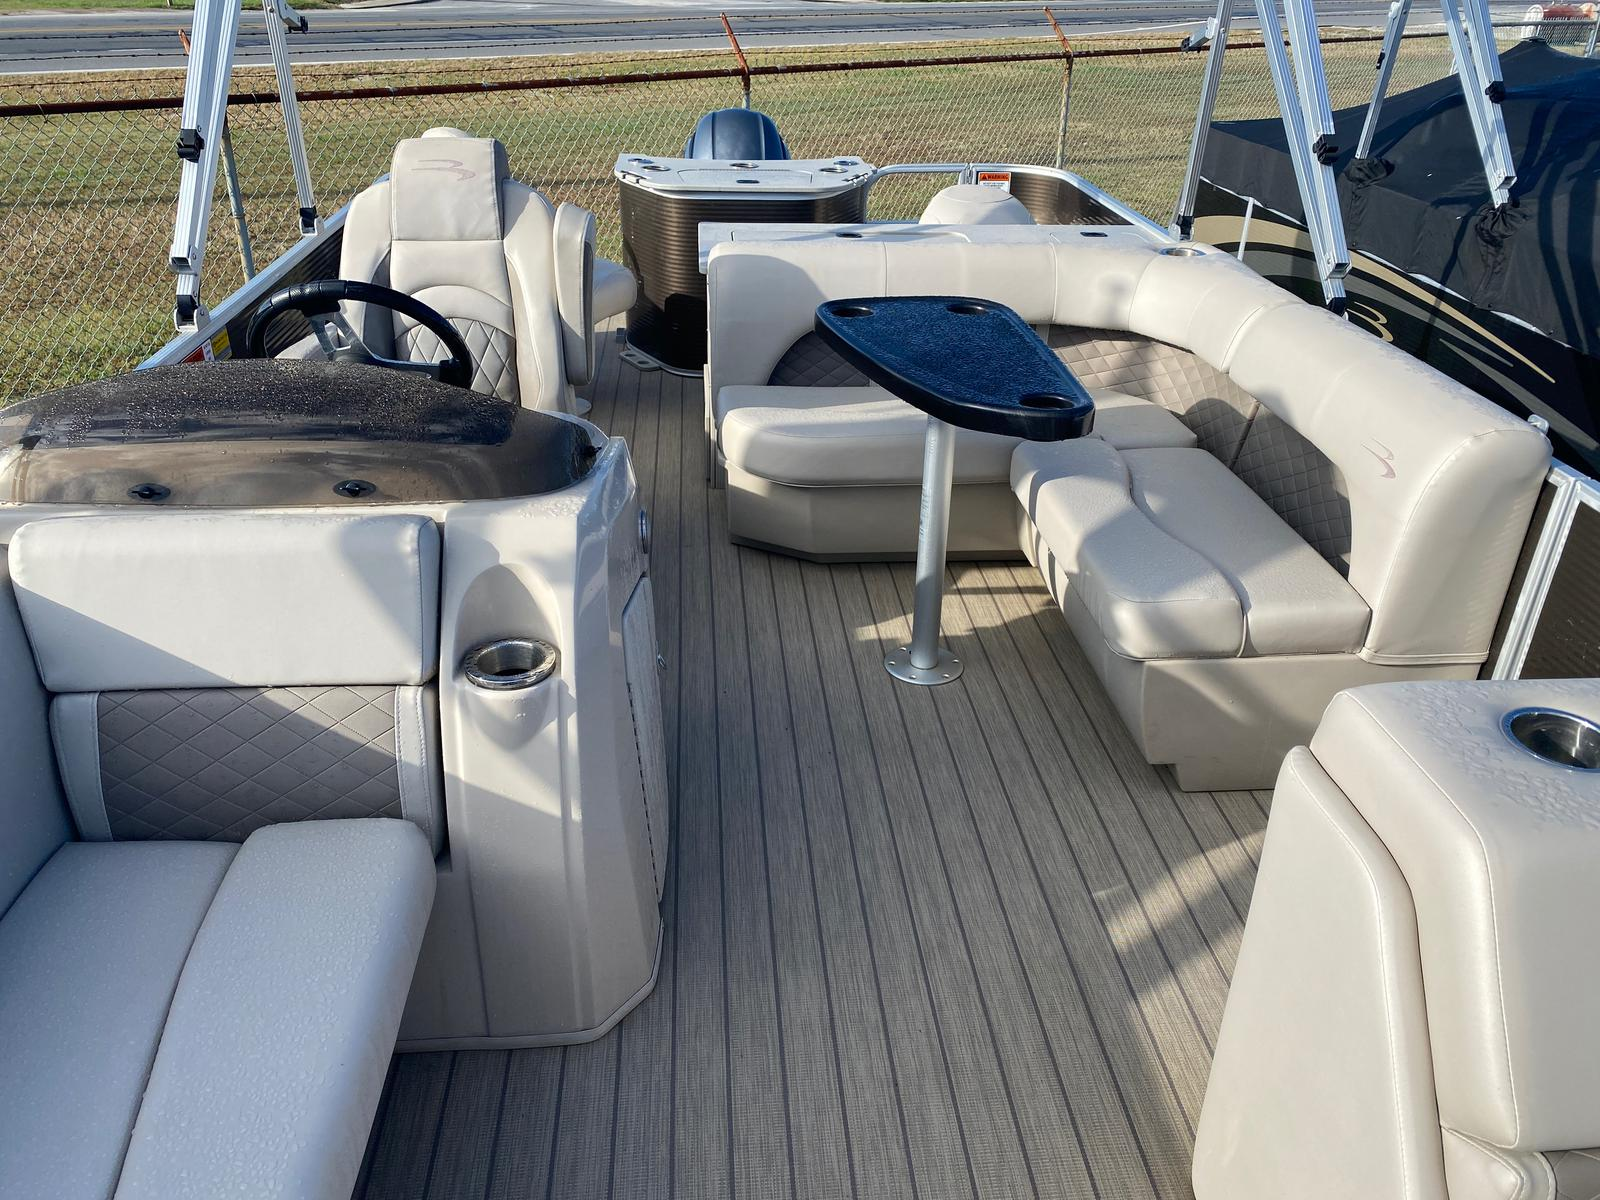 2018 Bennington boat for sale, model of the boat is 22 SSX Pontoon & Image # 5 of 13